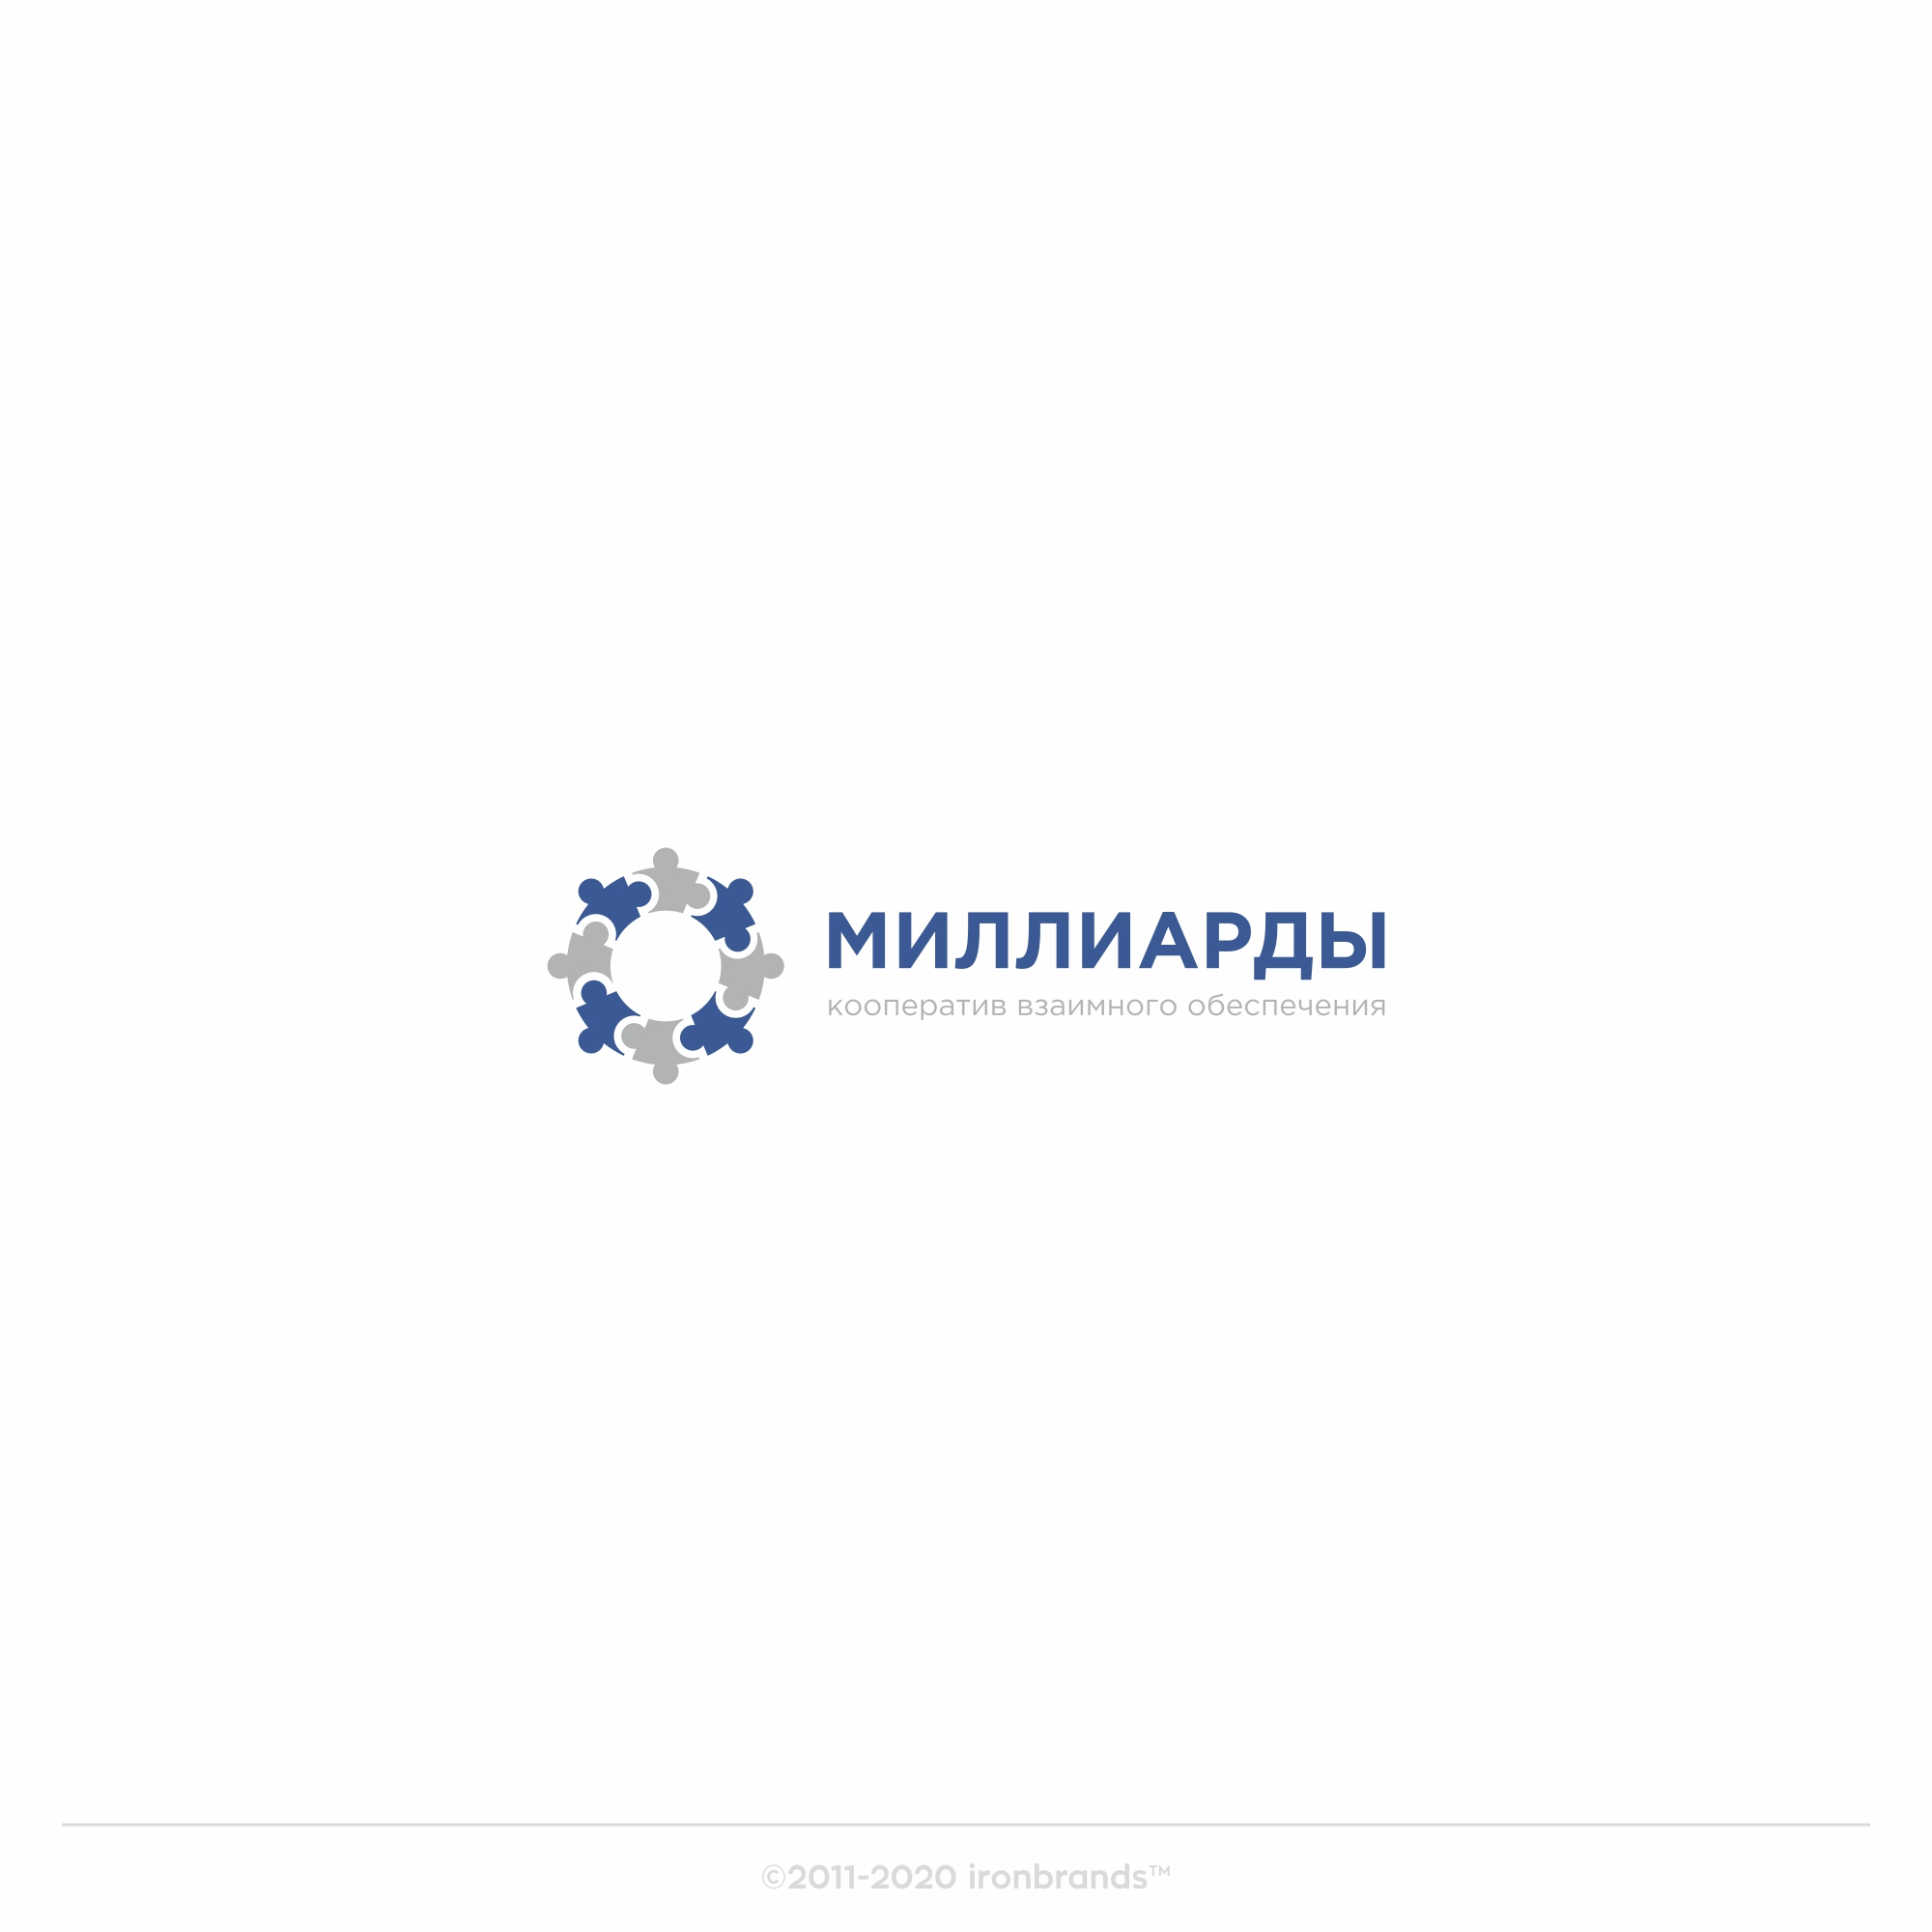 Создание логотипа фото f_6845e41295946b43.jpg